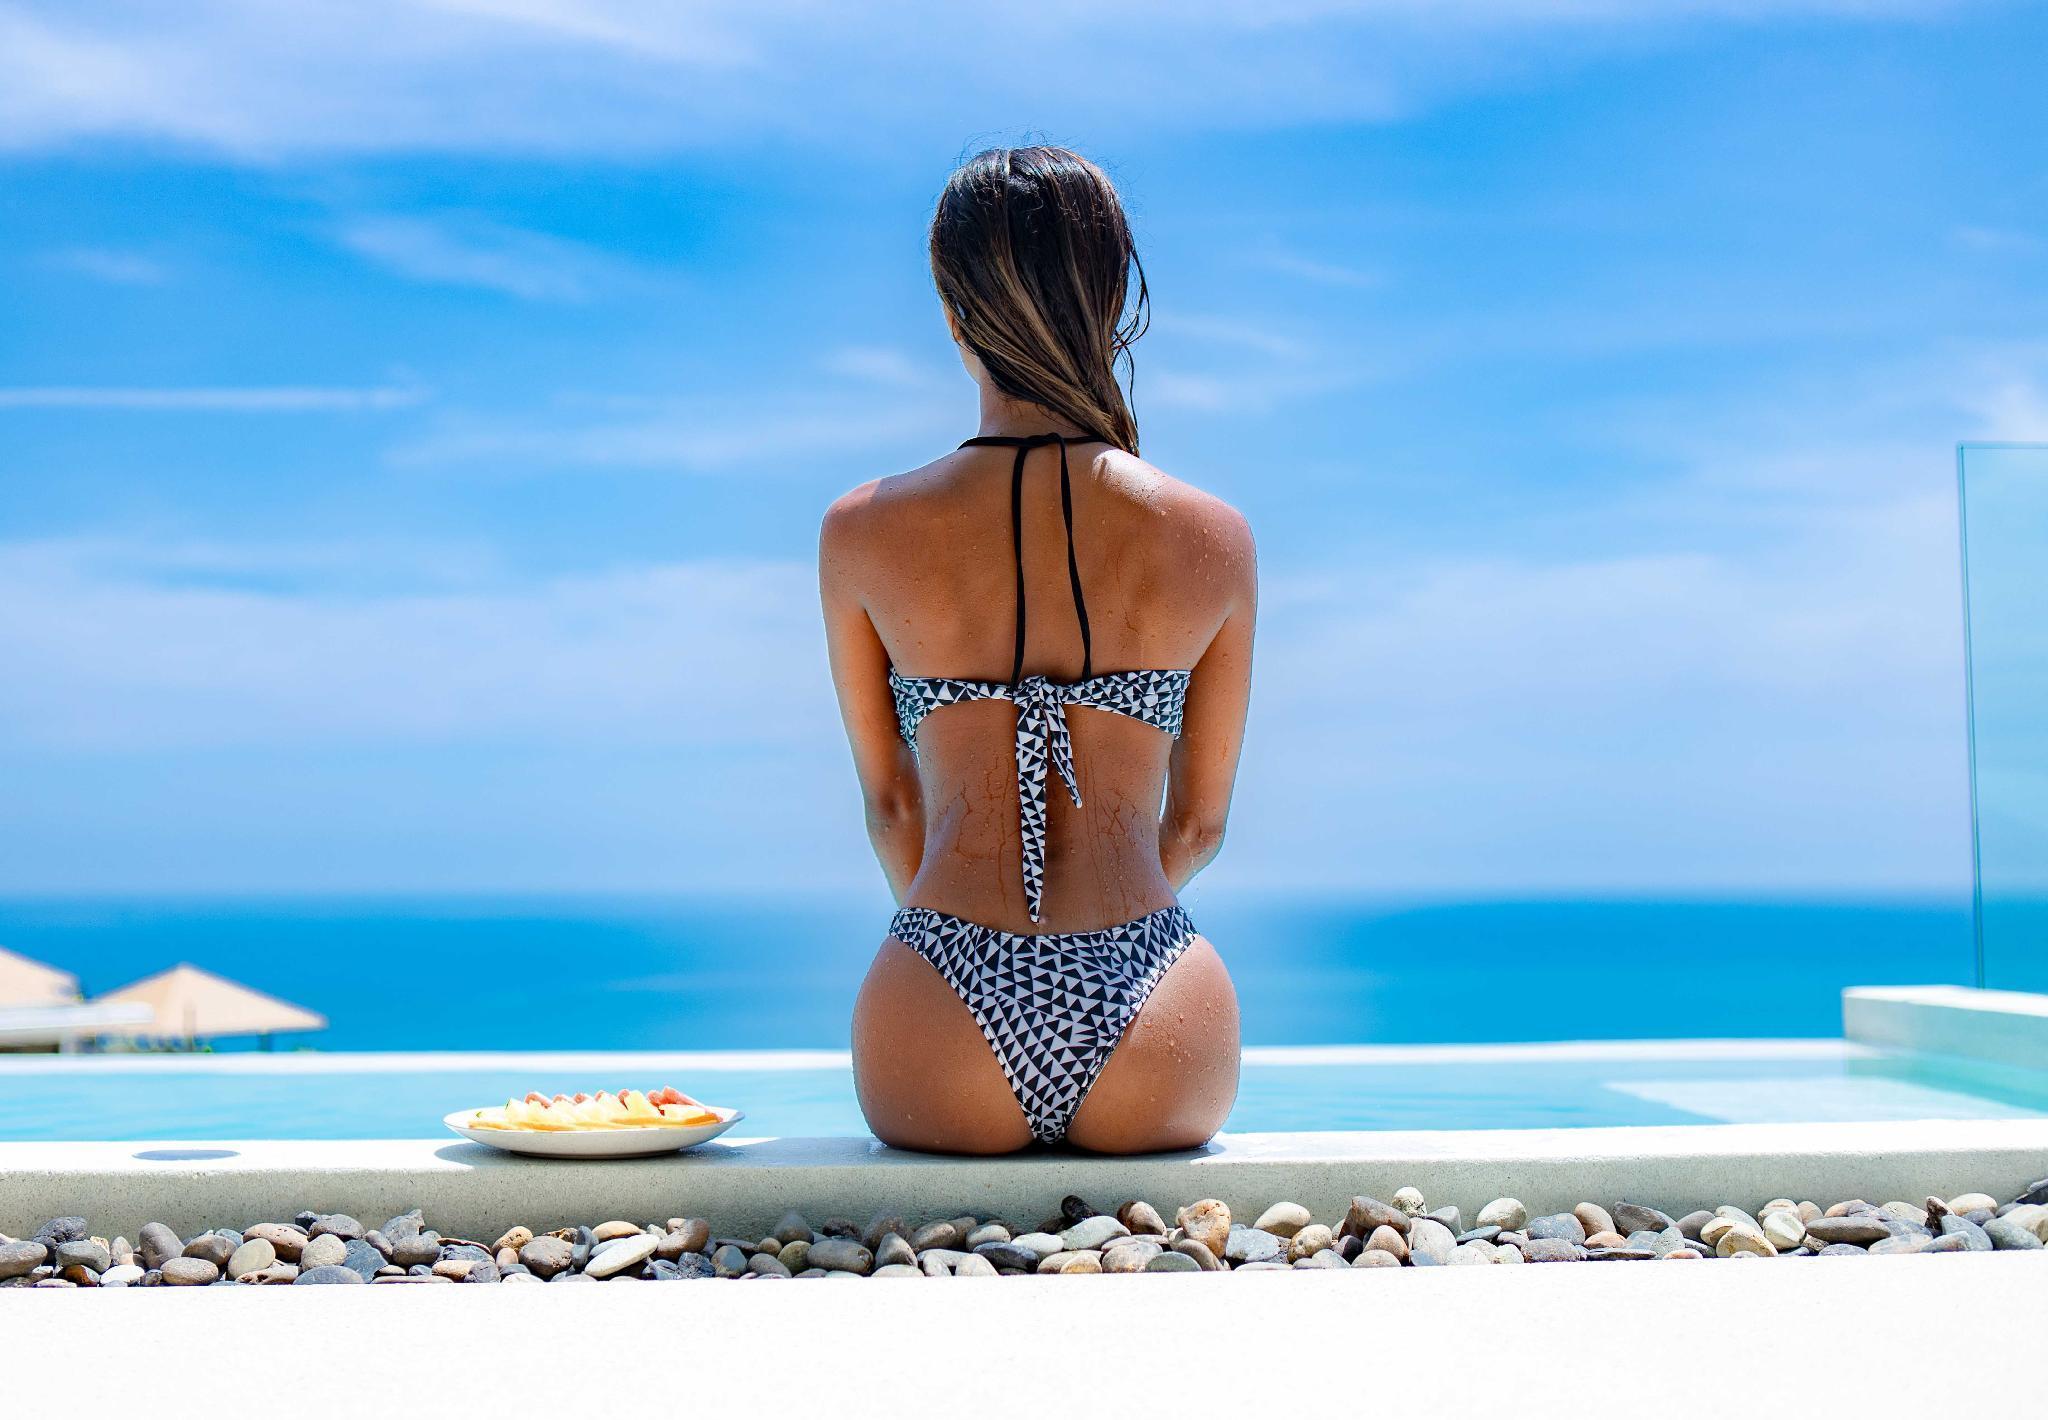 VILLA OCEAN LUXE | Sea View-Pool-Privacy-Service วิลลา 3 ห้องนอน 3 ห้องน้ำส่วนตัว ขนาด 140 ตร.ม. – เฉวงน้อย